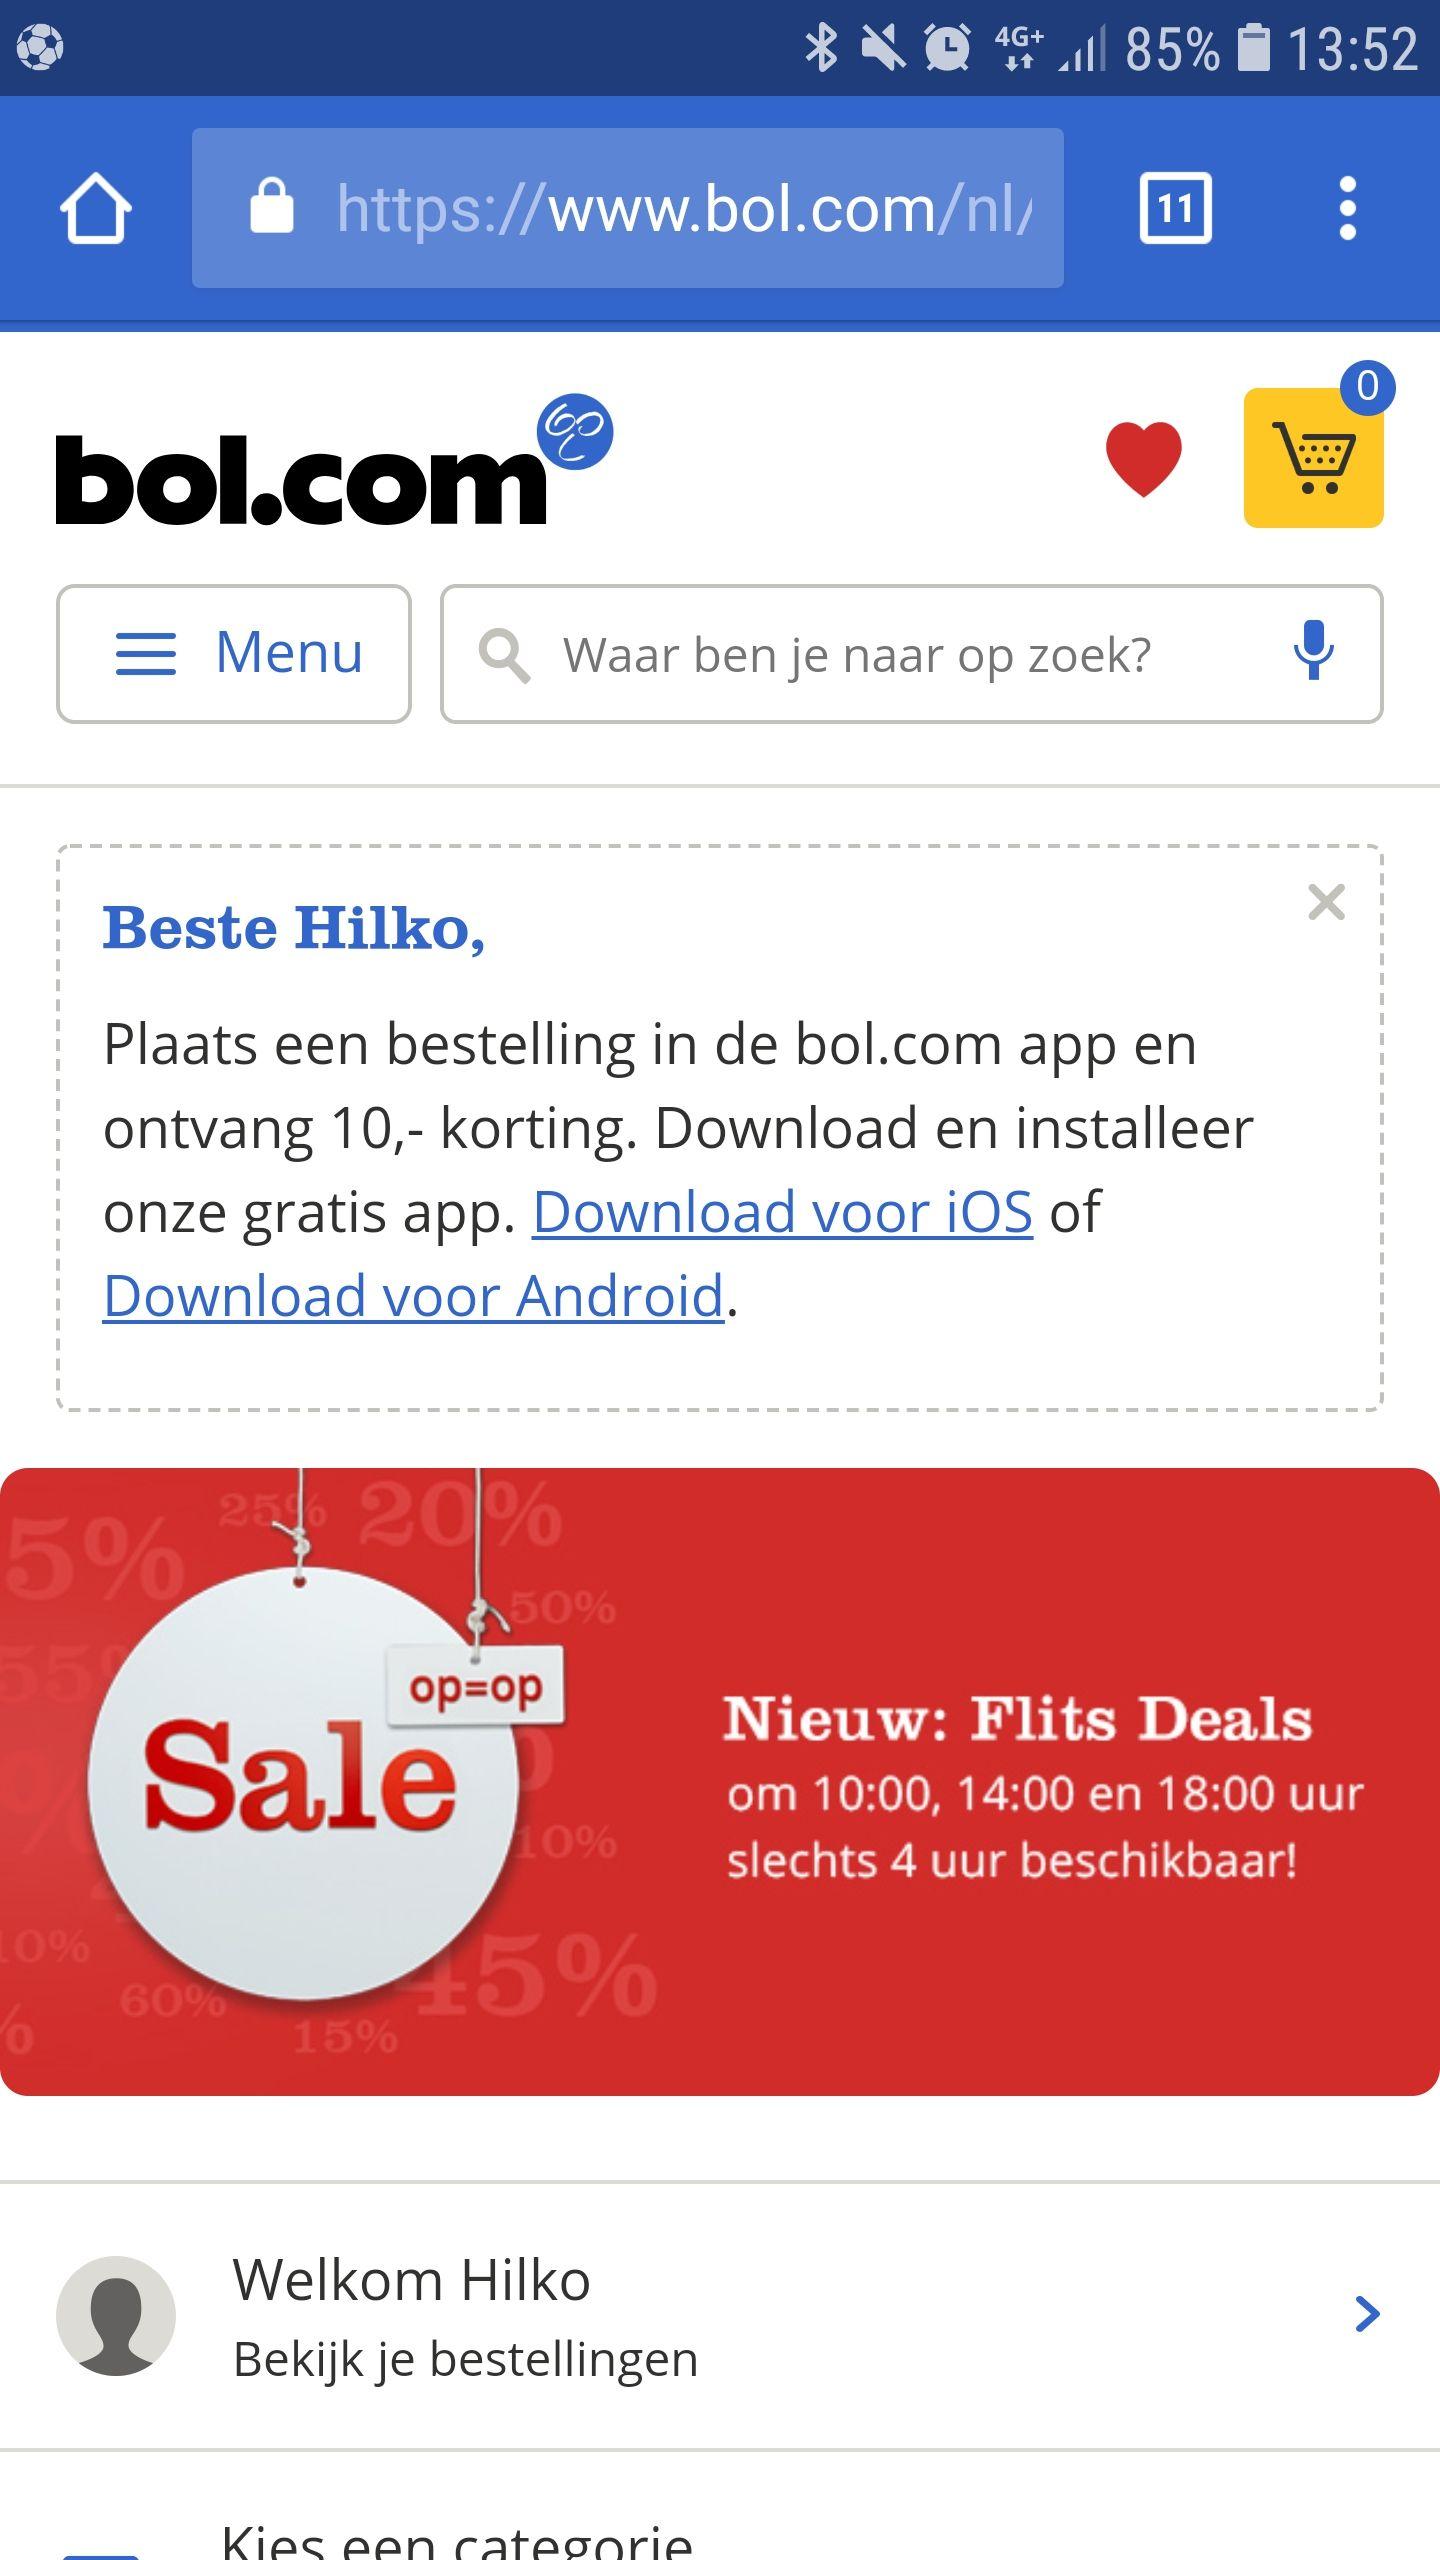 10 euro korting bij besteding vanaf 50 euro bij bol.com